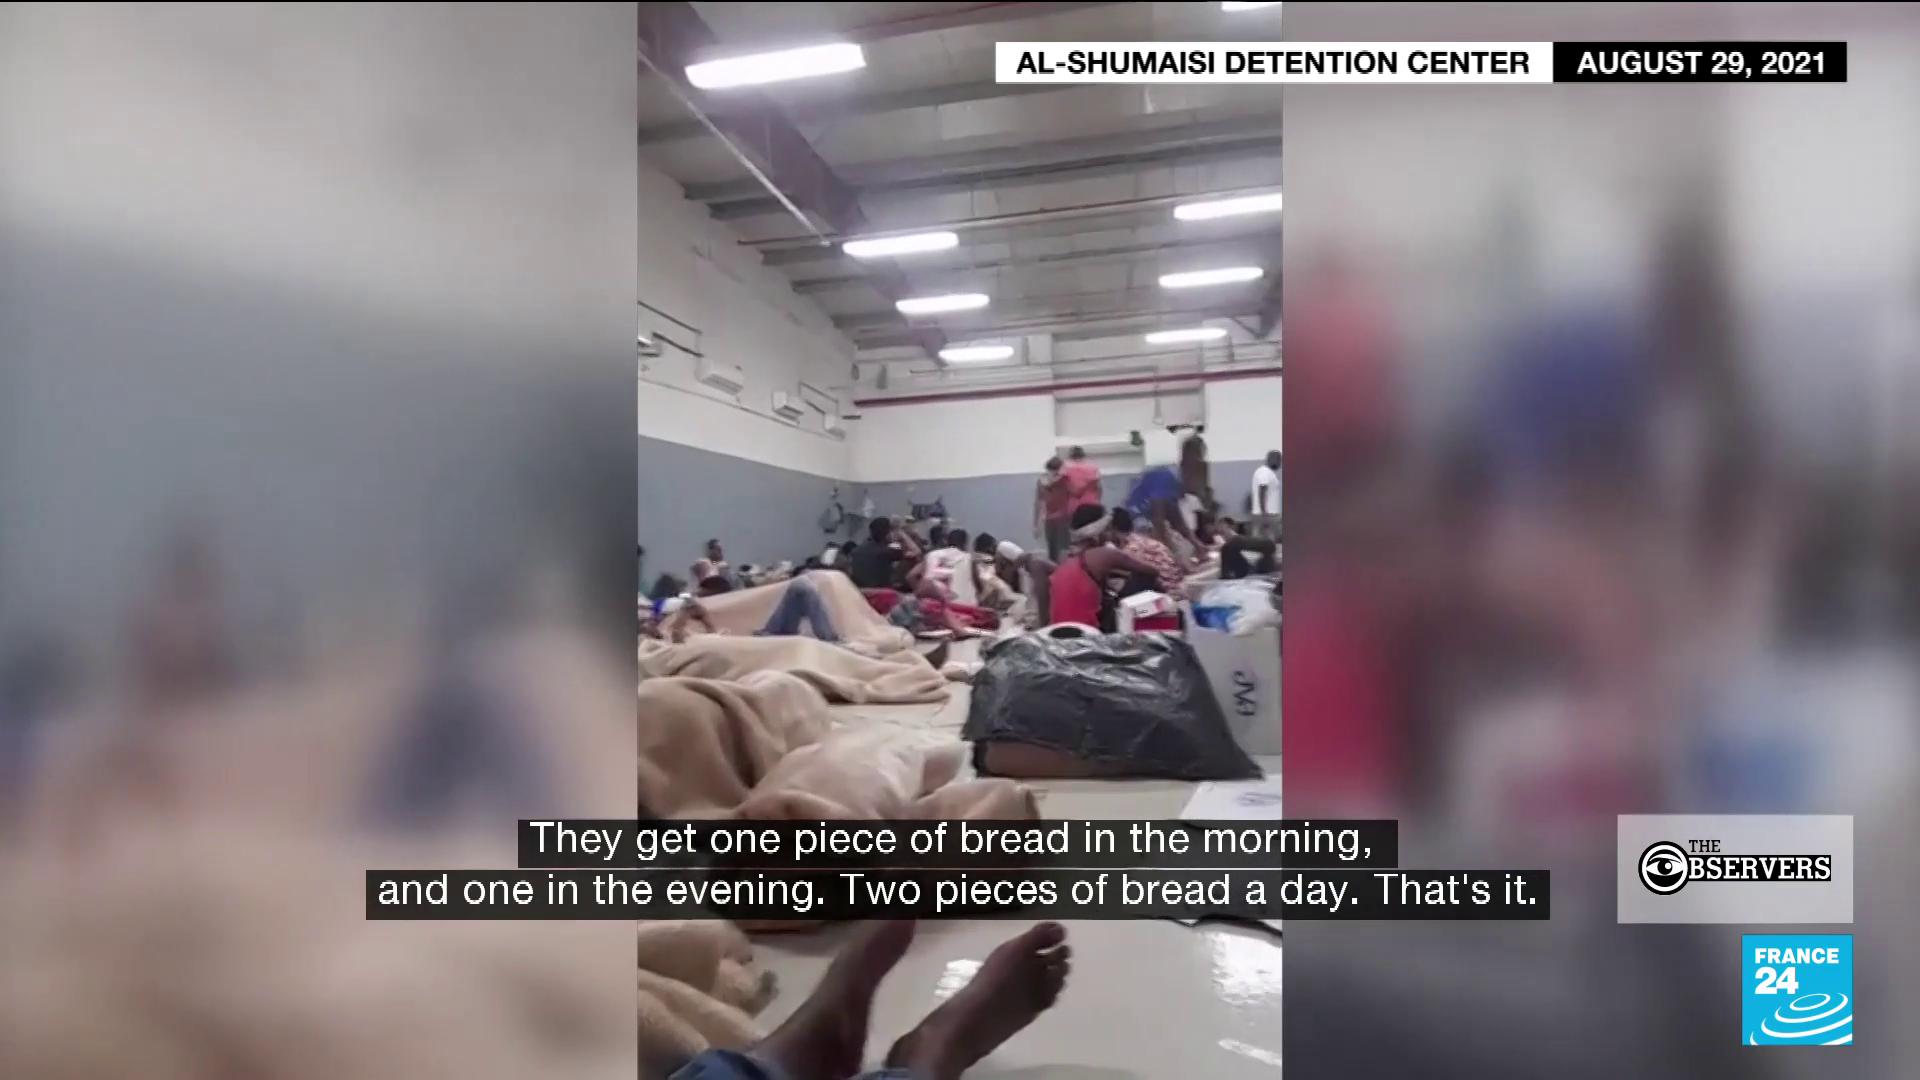 Prison Saudi Arabia